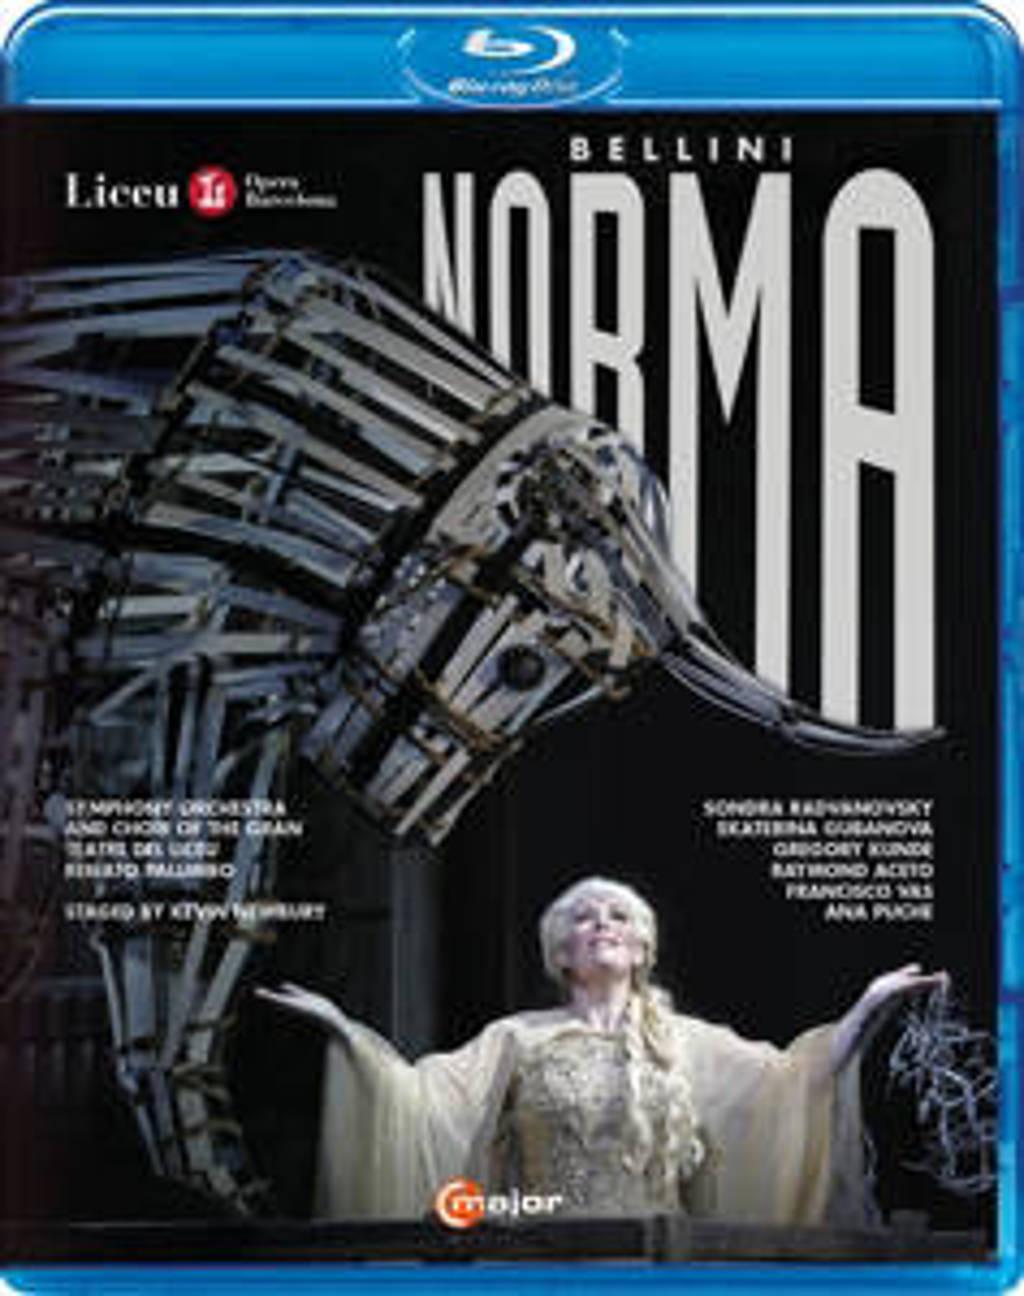 Radvanovsky & Kunde & Gubanova & Gr - Norma (Blu-ray)